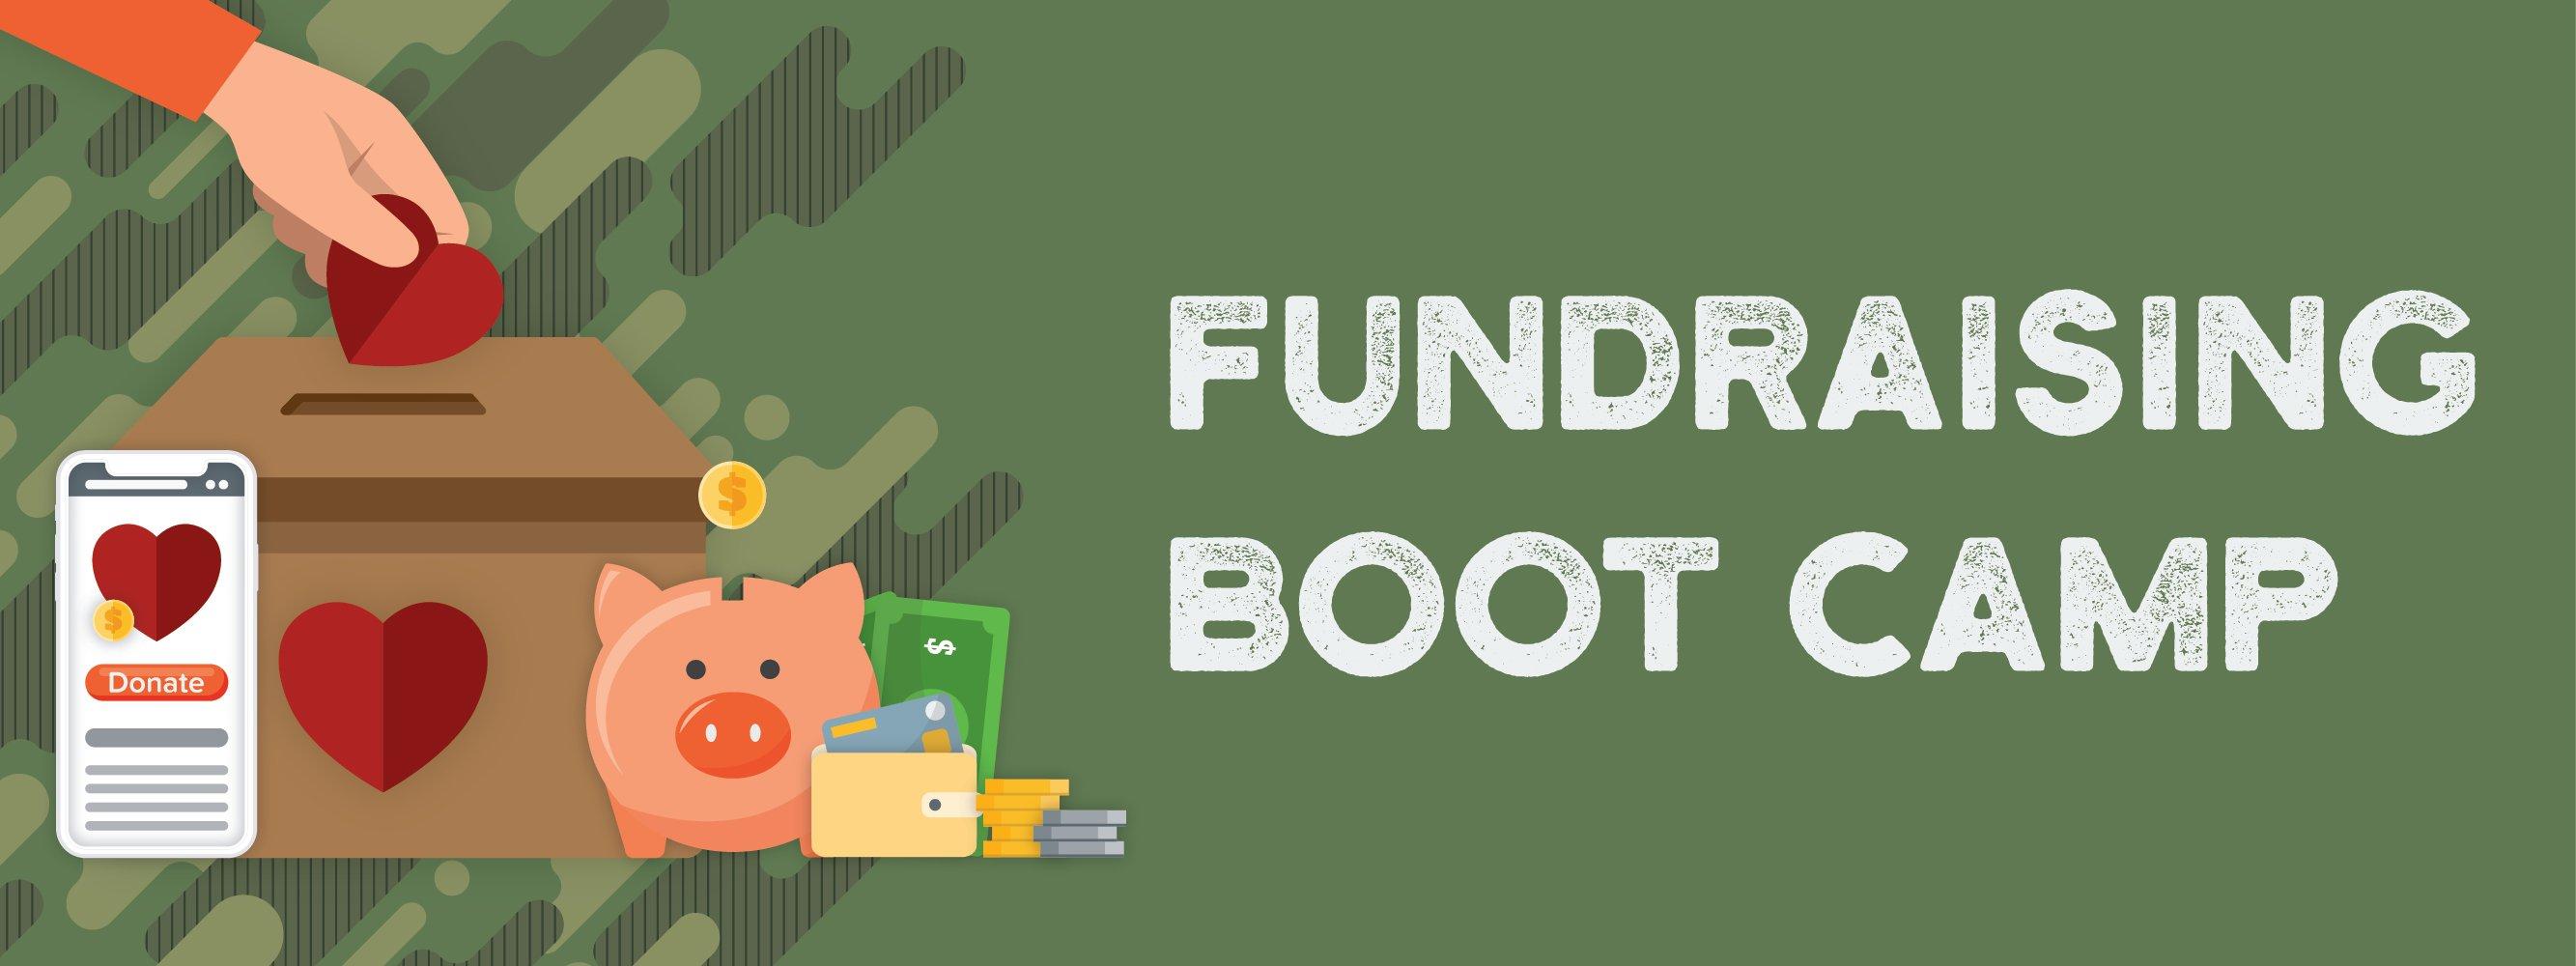 2020-Hero-FundraisingBootcampEseries-2667x1000